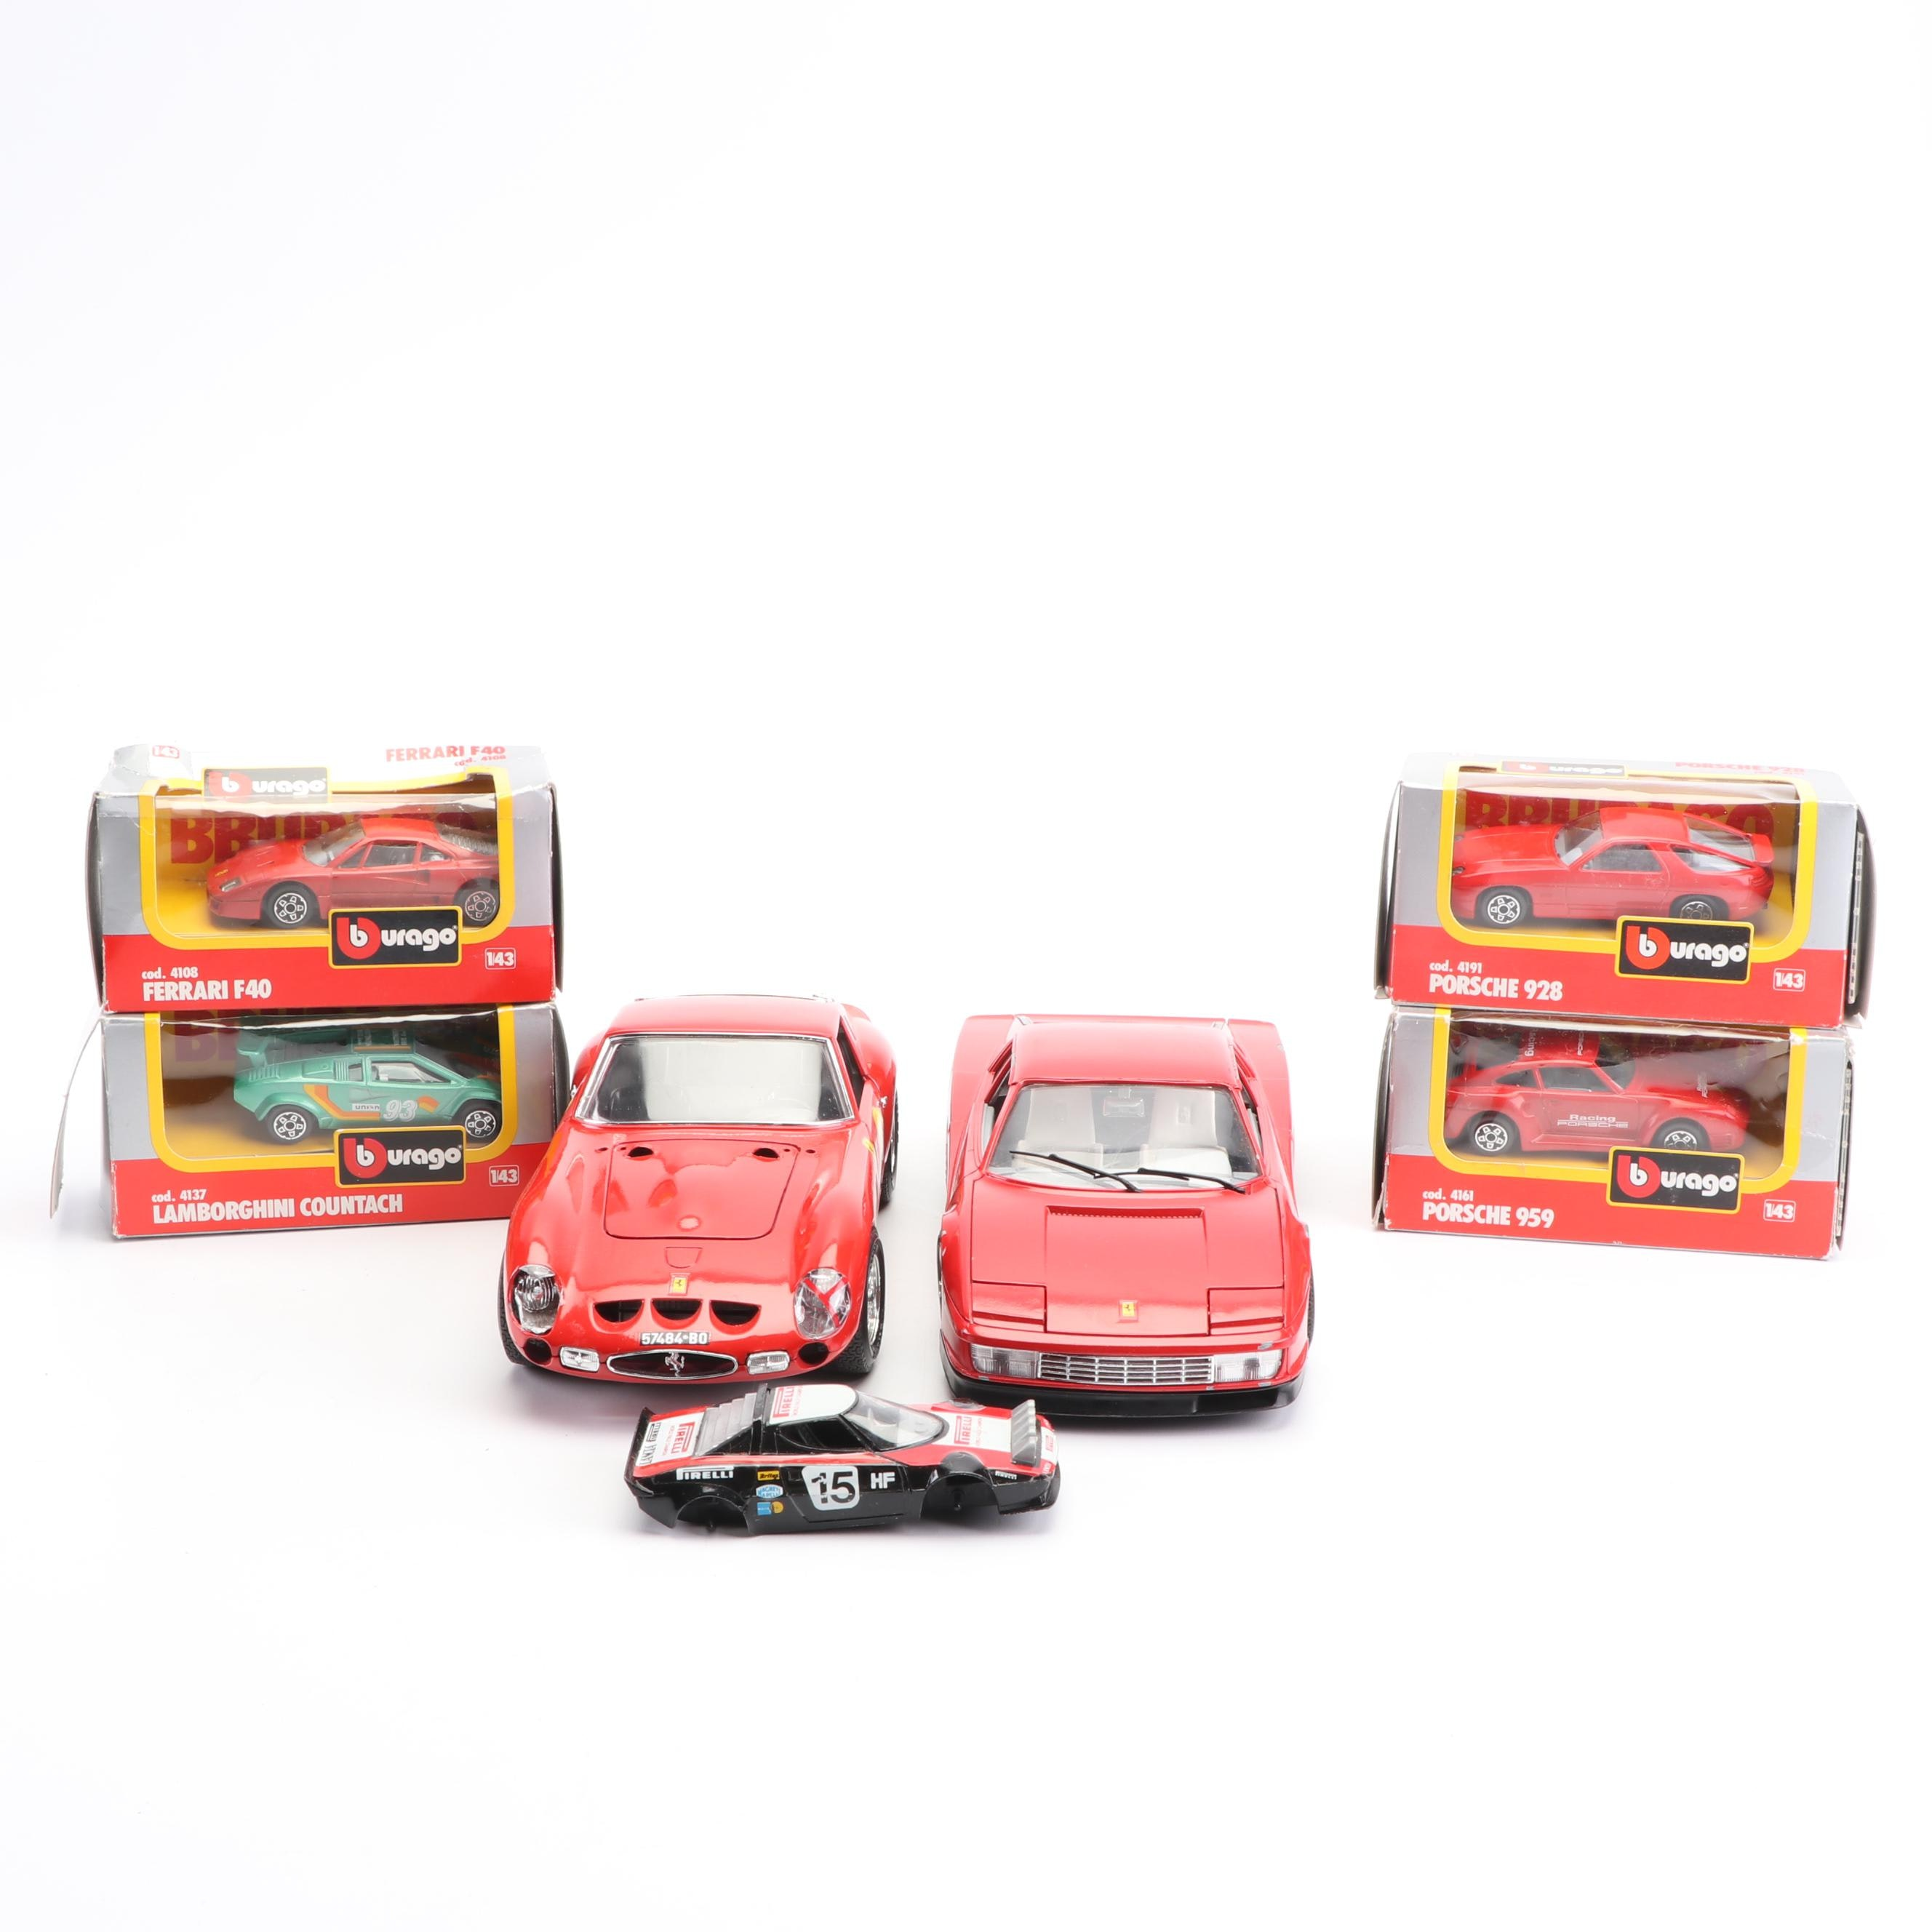 Bburago Die-Cast Model Cars including Ferrari, Porsche and Lamborghini